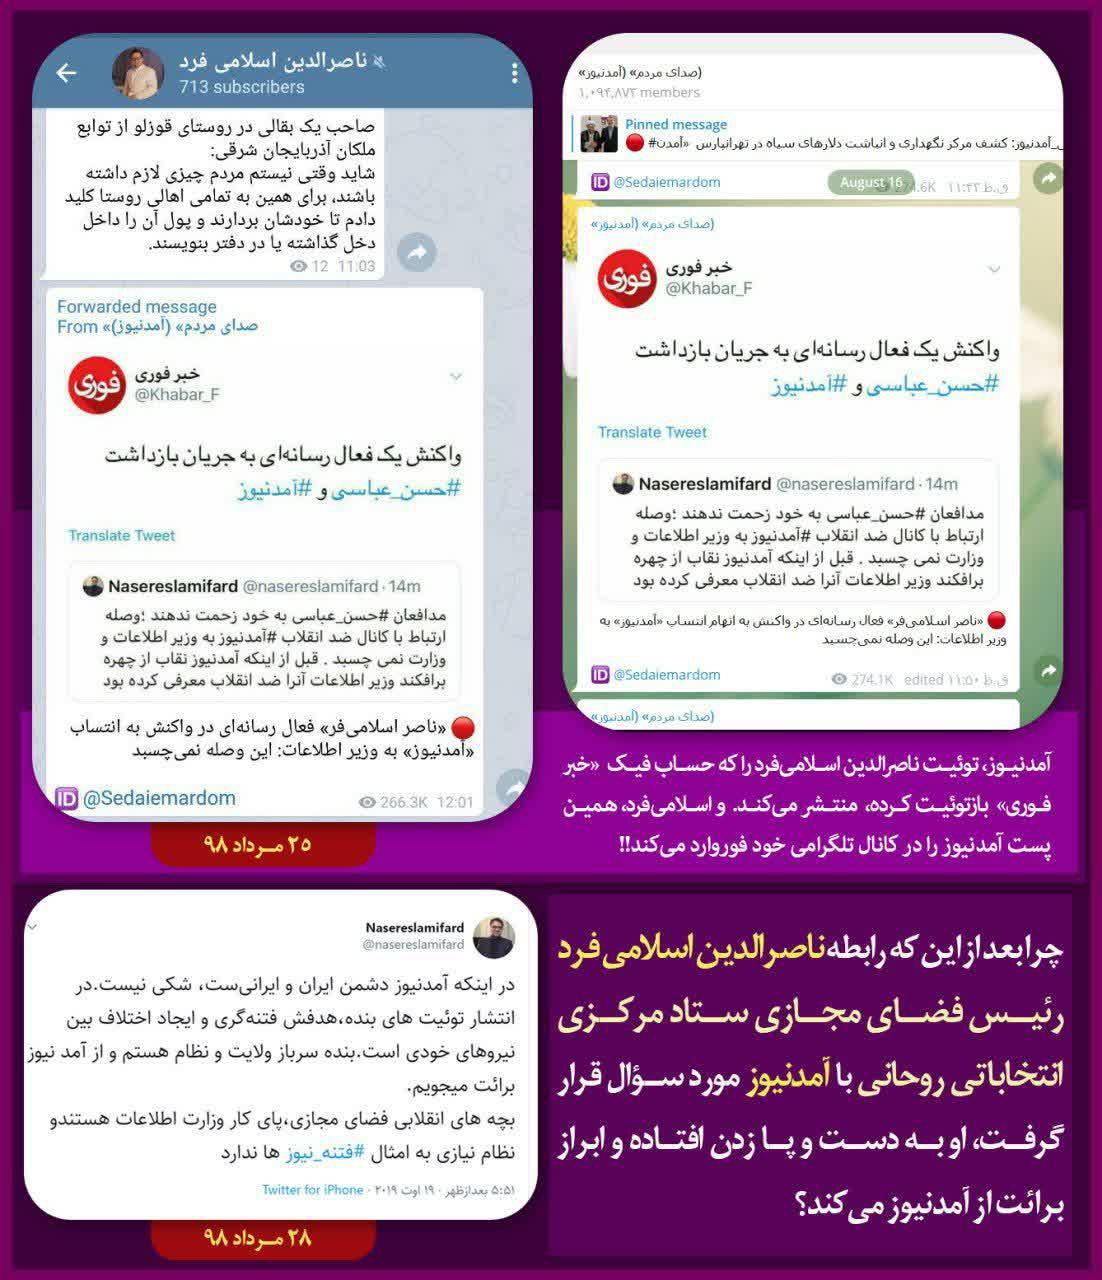 eslamifard%20%286%29 یک حساب گمنام جديد و تو و تازه تاسیس توئیت میکند، آمدنیوز انعکاس میدهد